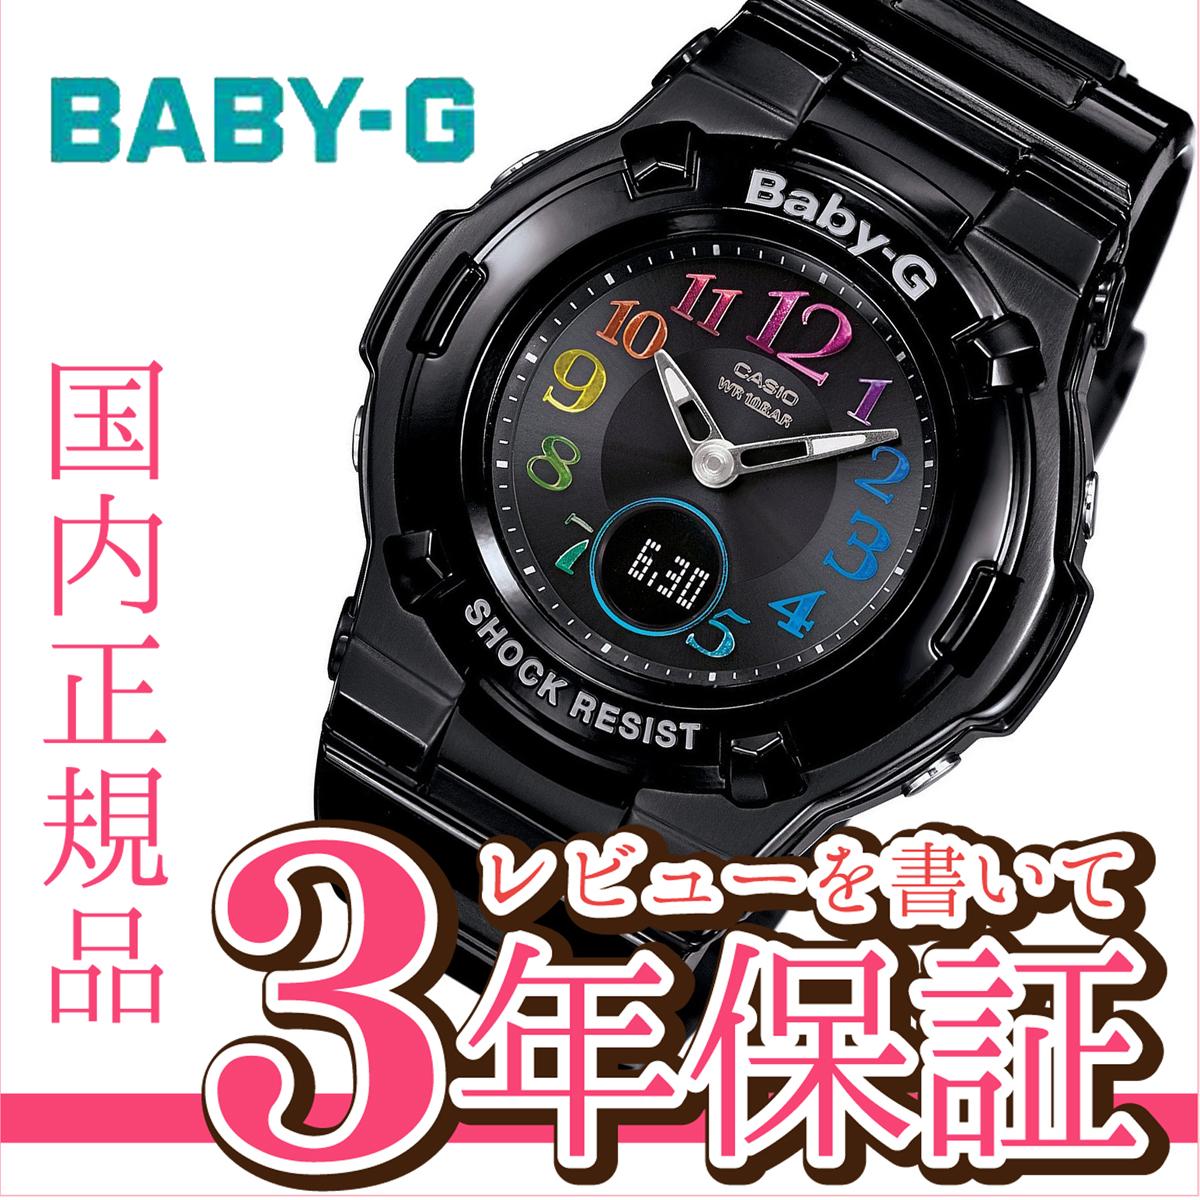 CASIO BABY-G カシオ ベビーG Tripper トリッパー 電波 ソーラー 電波時計 腕時計 レディース ブラック アナデジ BGA-1110GR-1BJF【正規品】【1502】【5sp】【店頭受取対応商品】